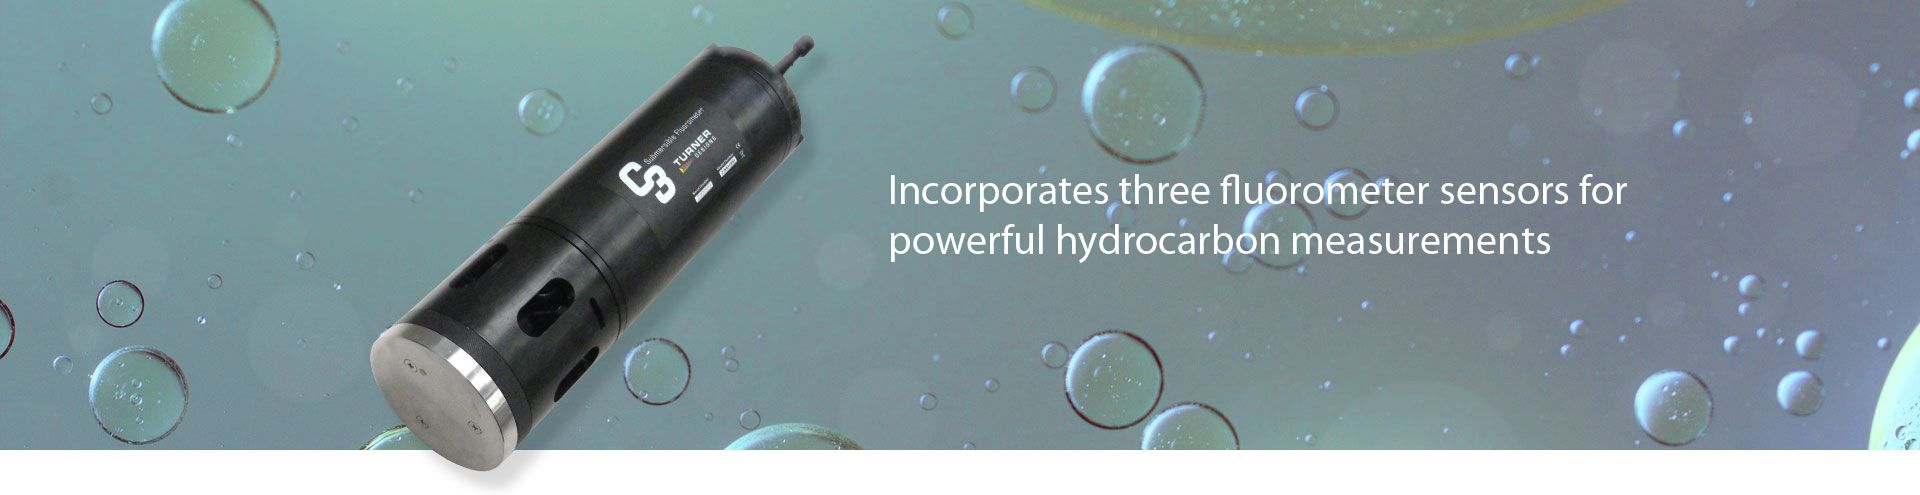 C3 Hydrocarbon Fluorometer Rental